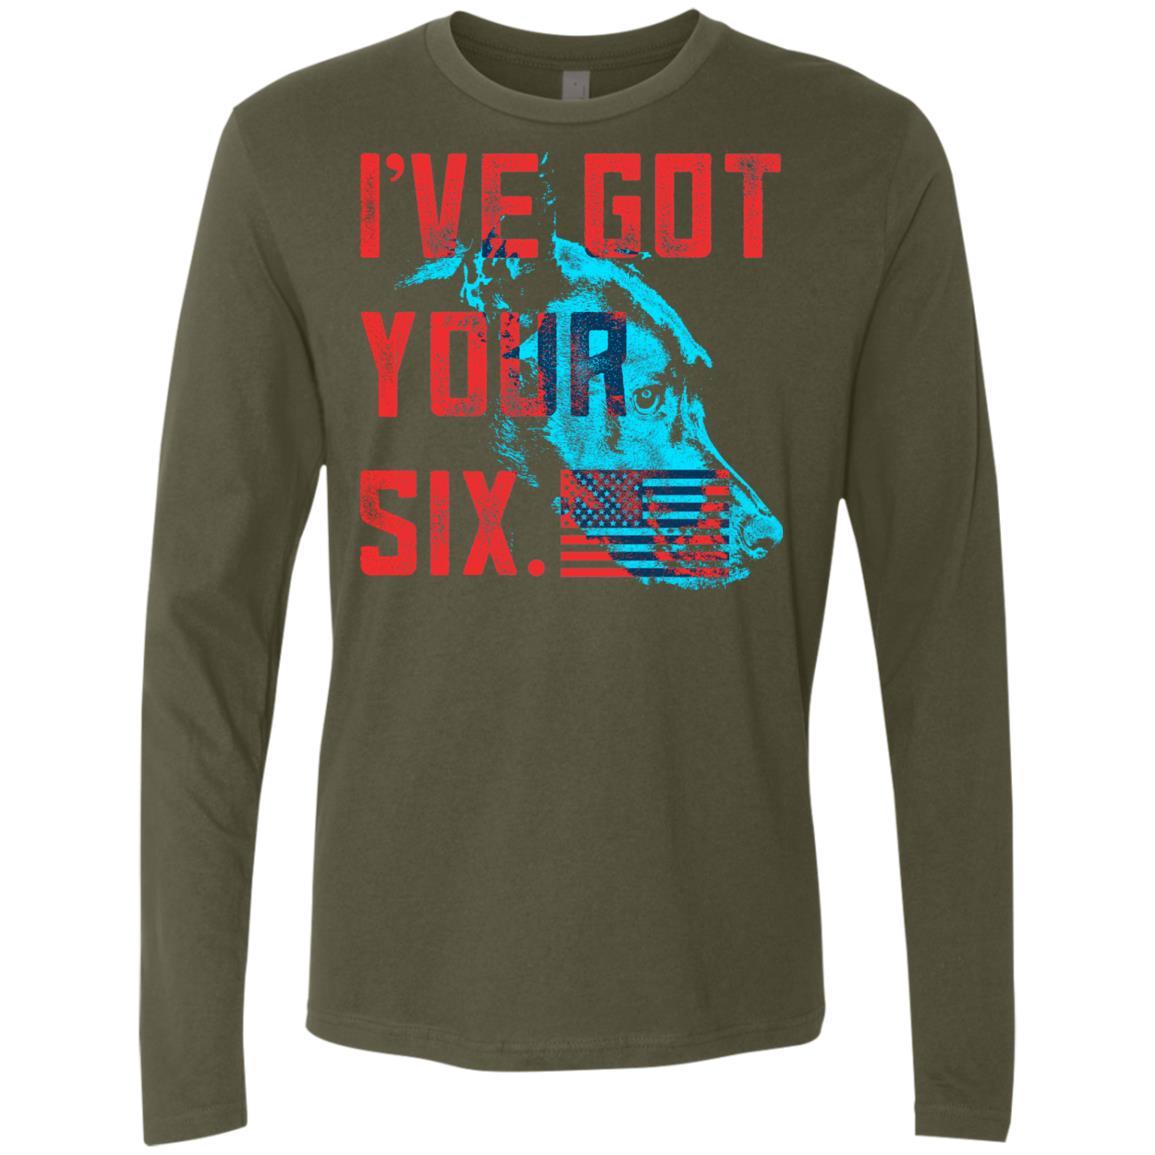 Got Your Six Premium Long Sleeve Shirt – iHeartDogs.com